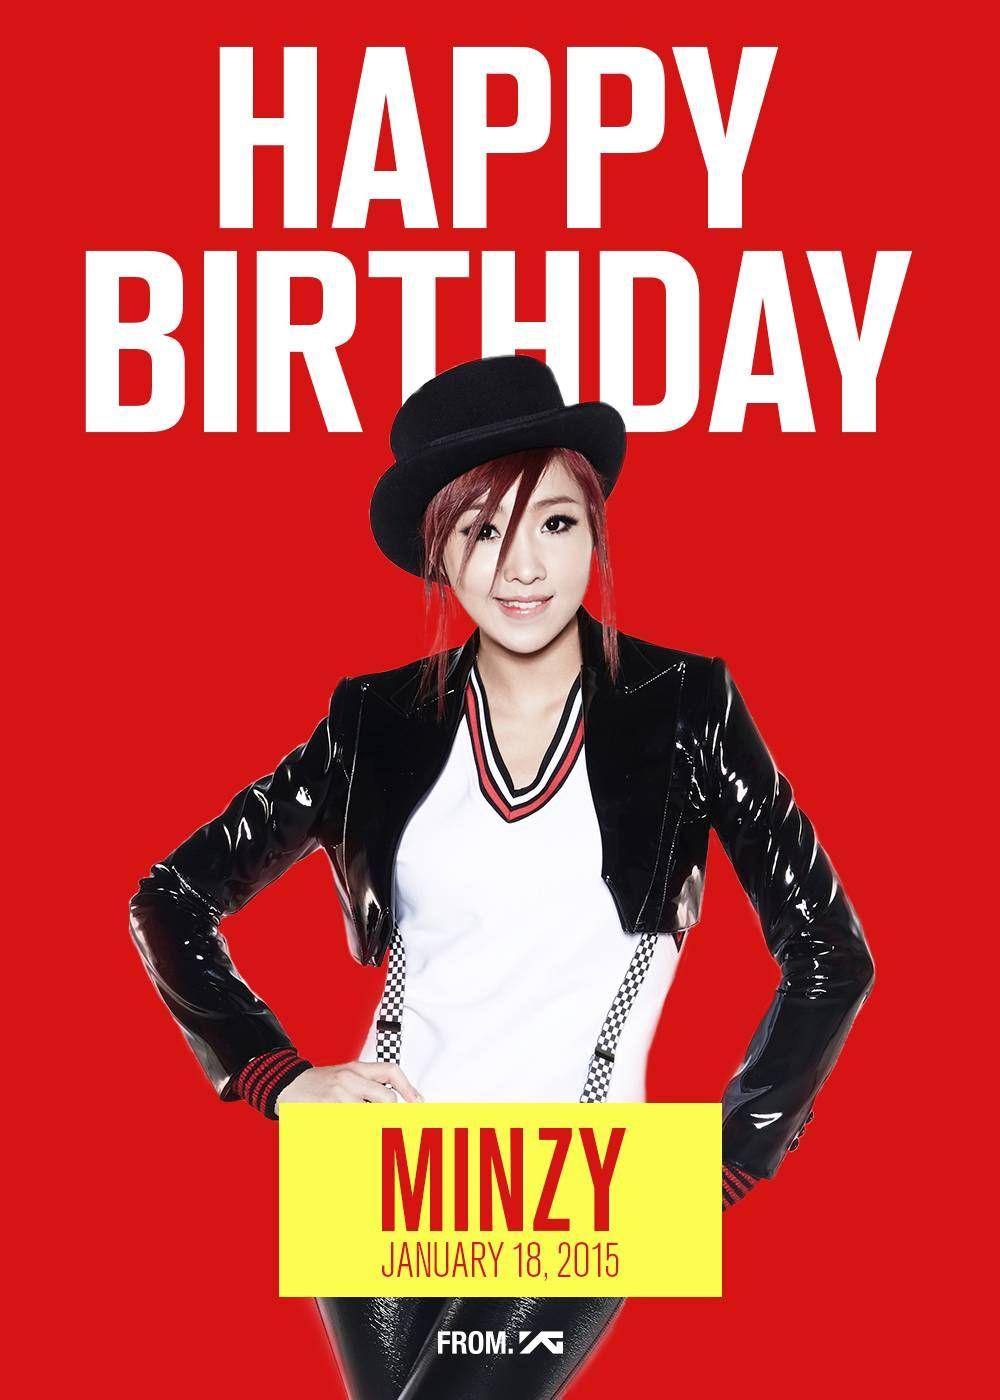 Fans celebrate Minzy's birthday on Twitter 2ne1, 2ne1